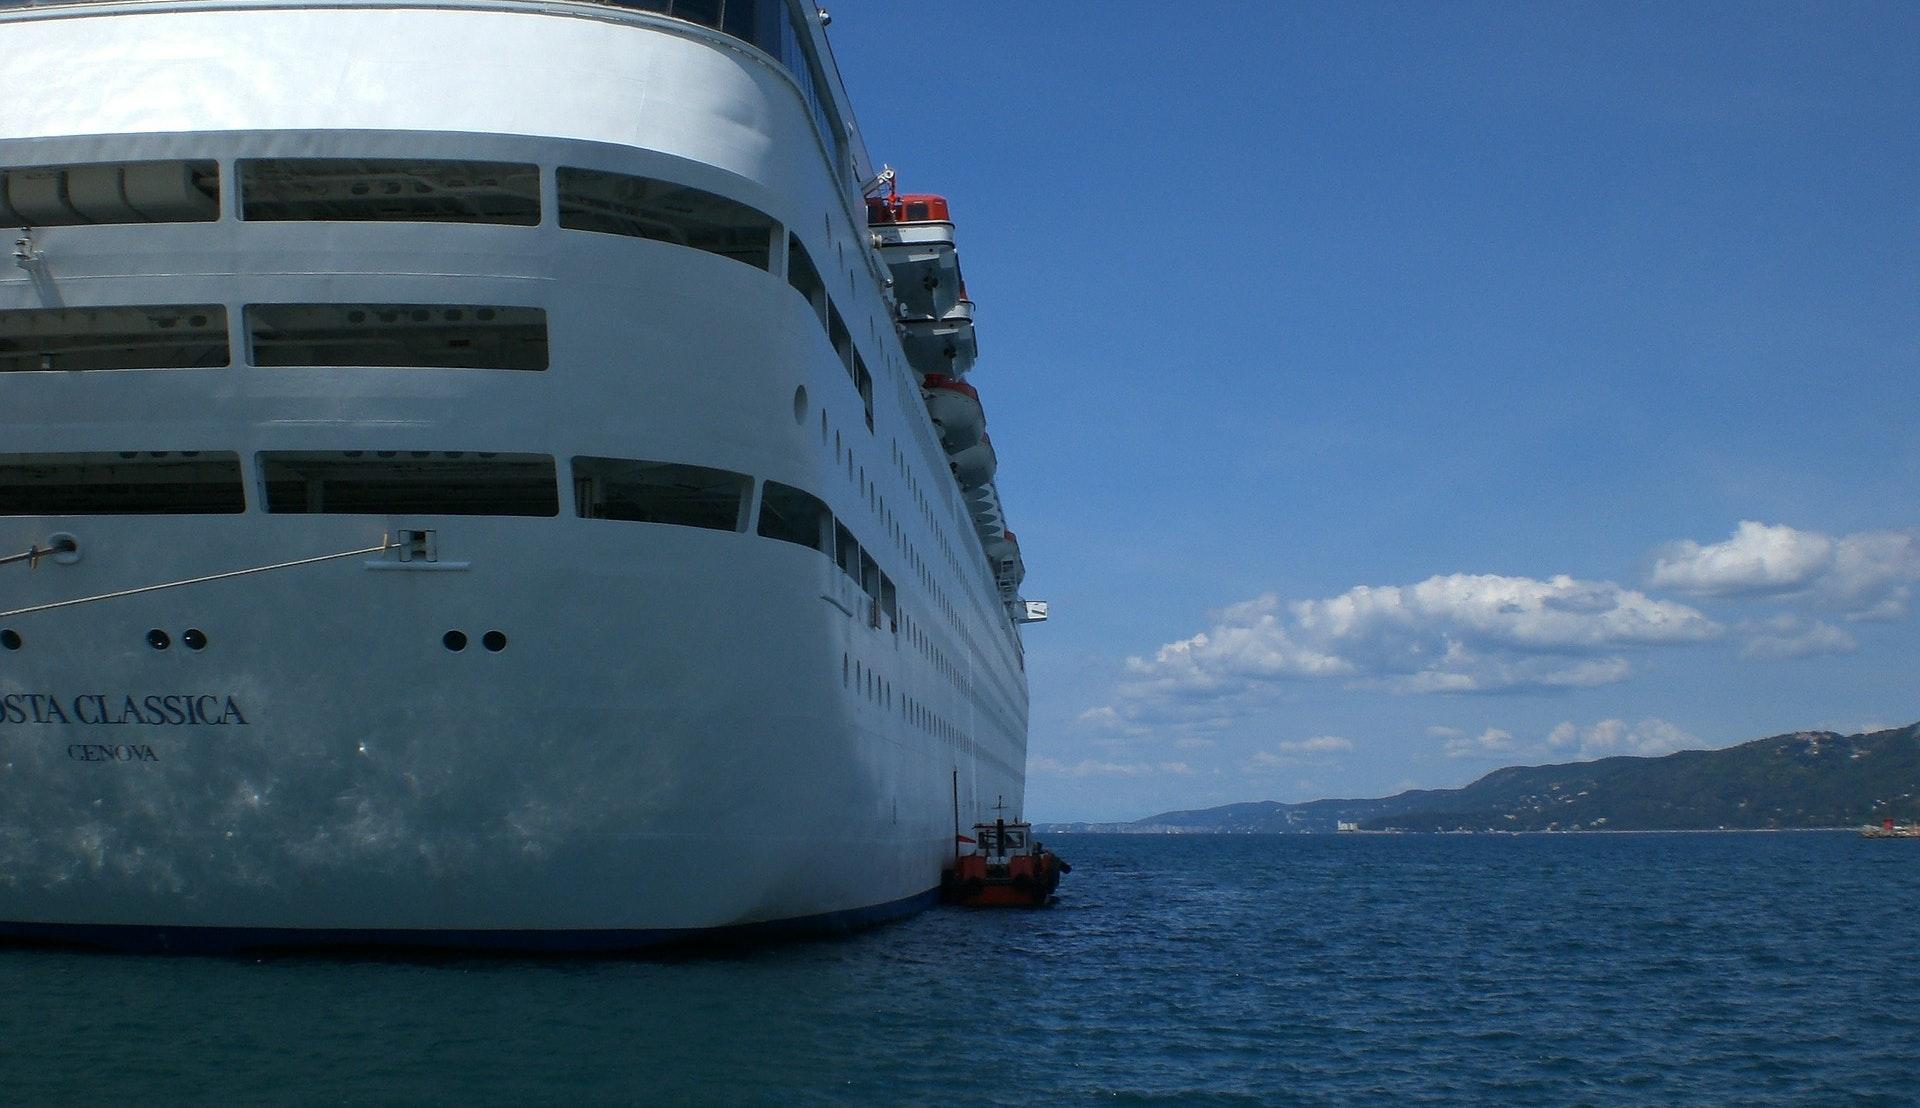 Cruiseskip i Trieste © 151390, Pixabay